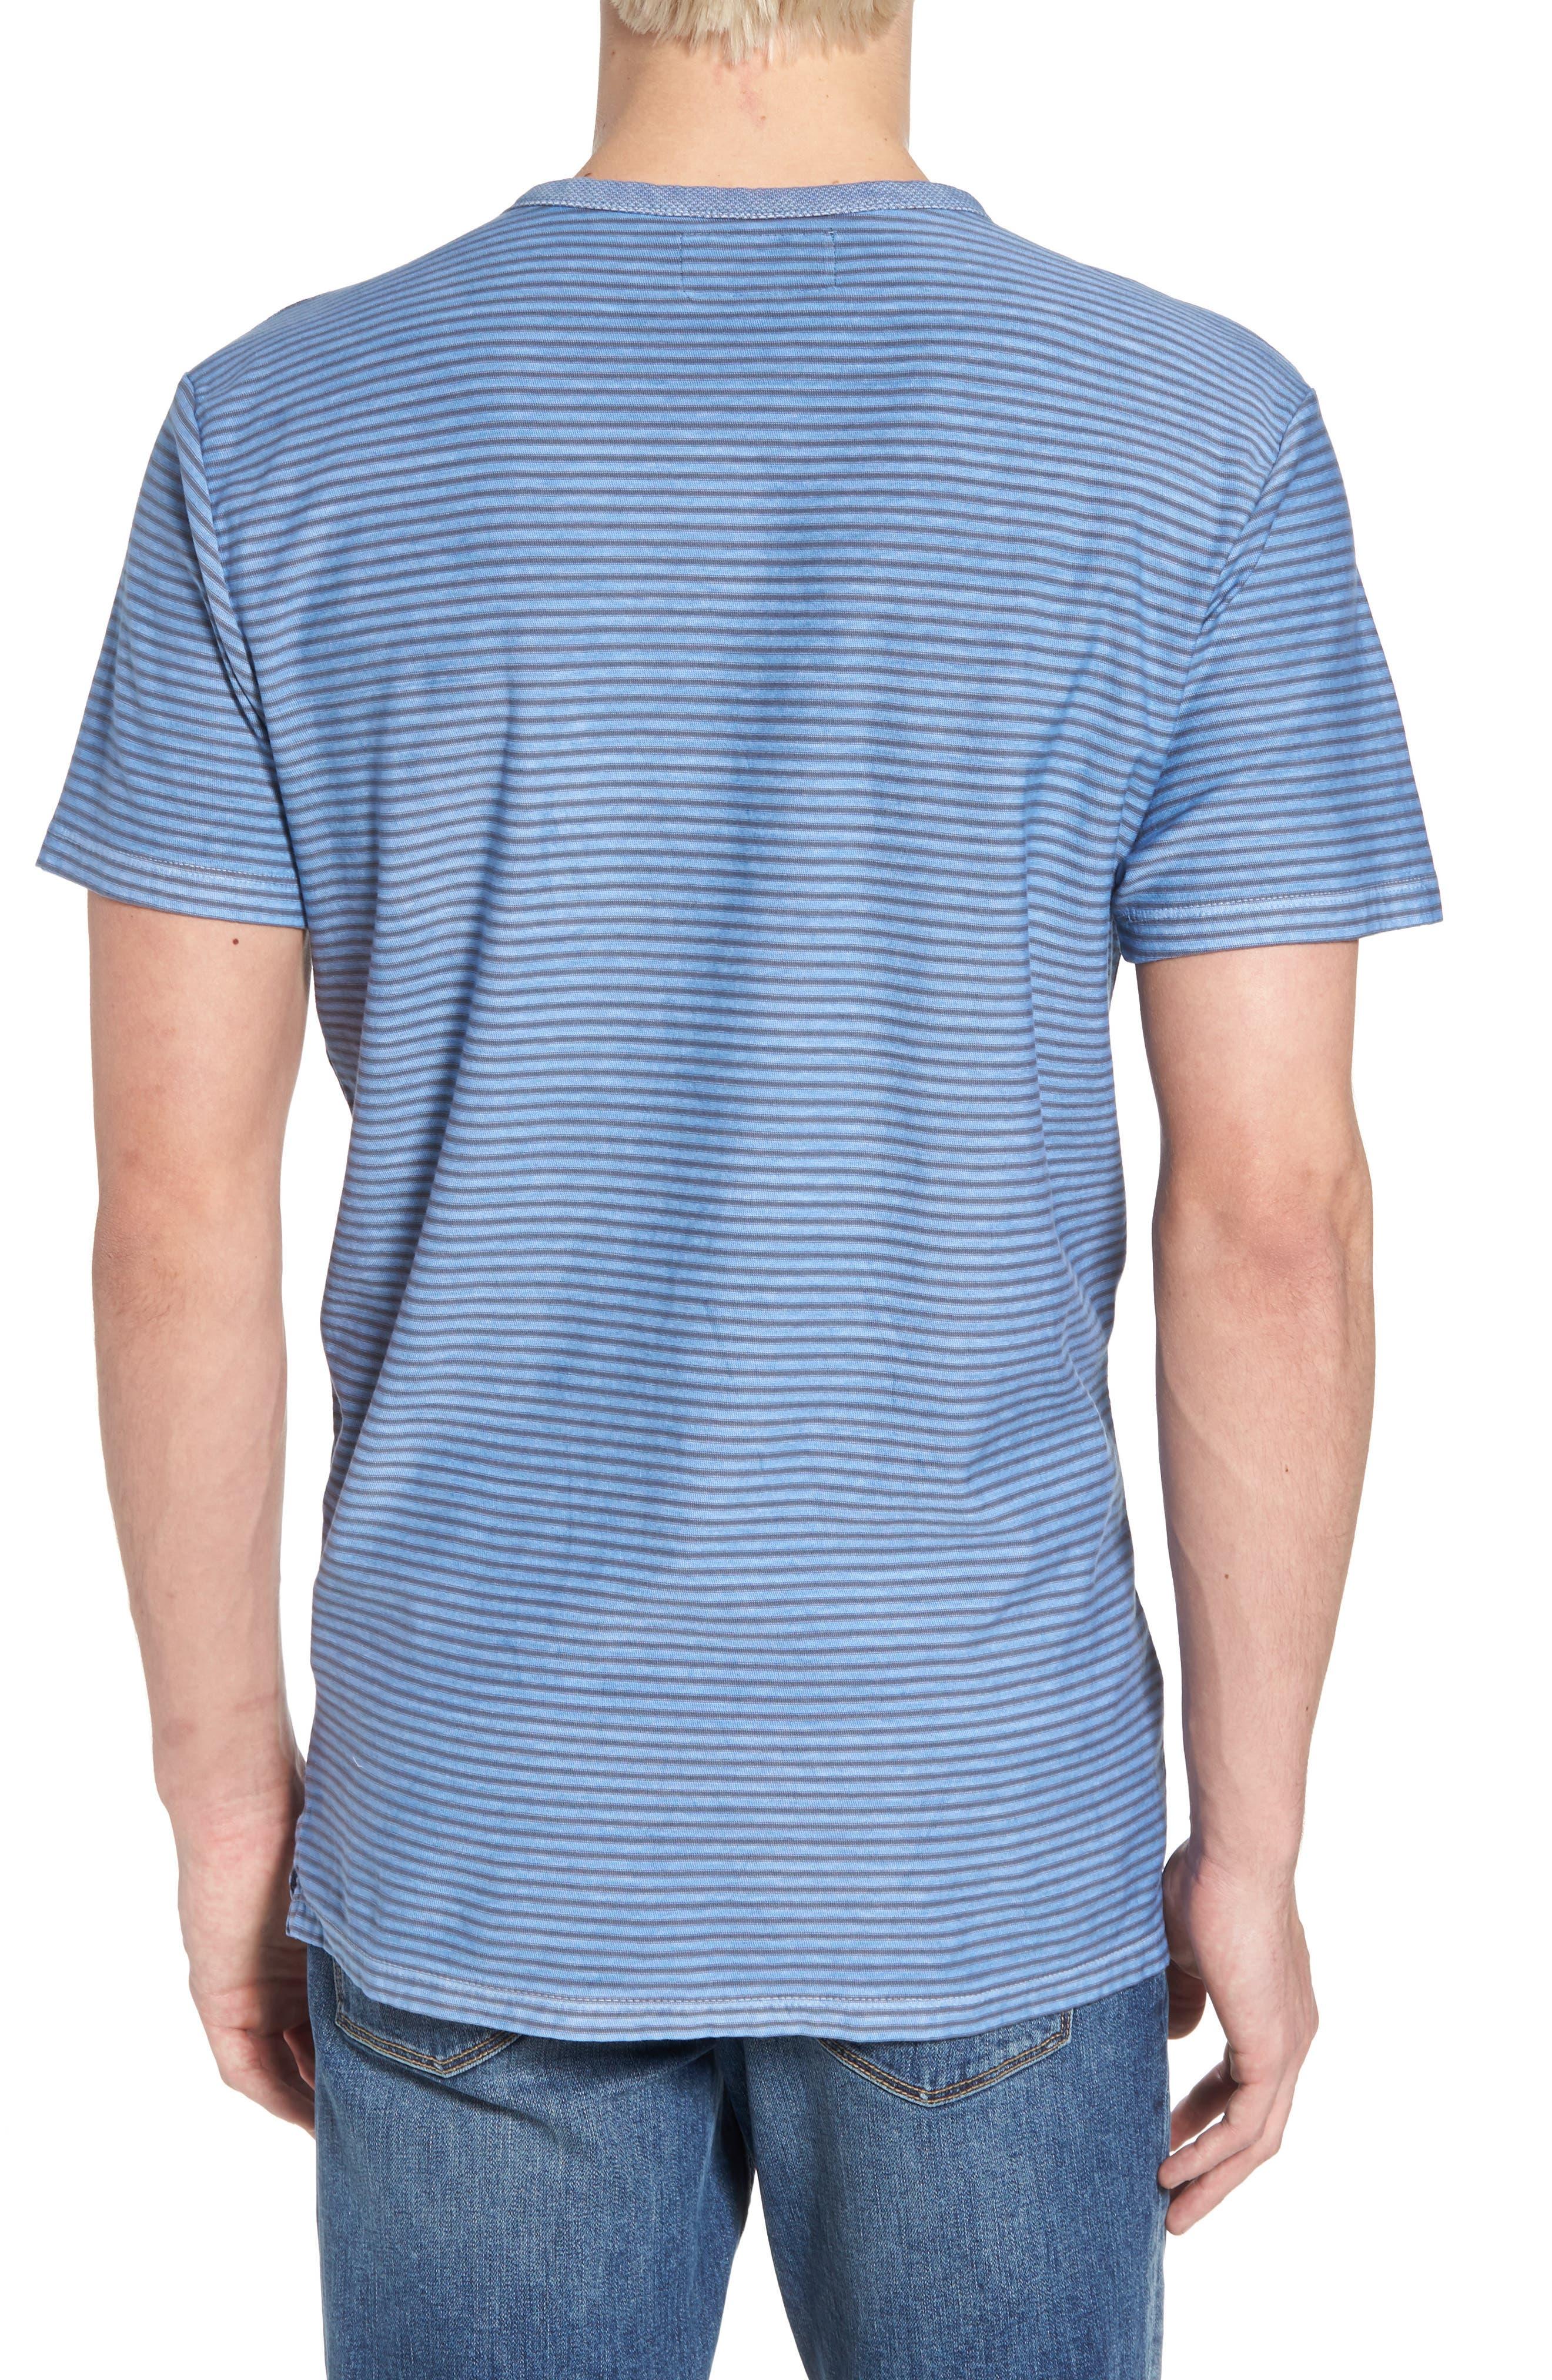 Stringer T-Shirt,                             Alternate thumbnail 2, color,                             Powder Blue